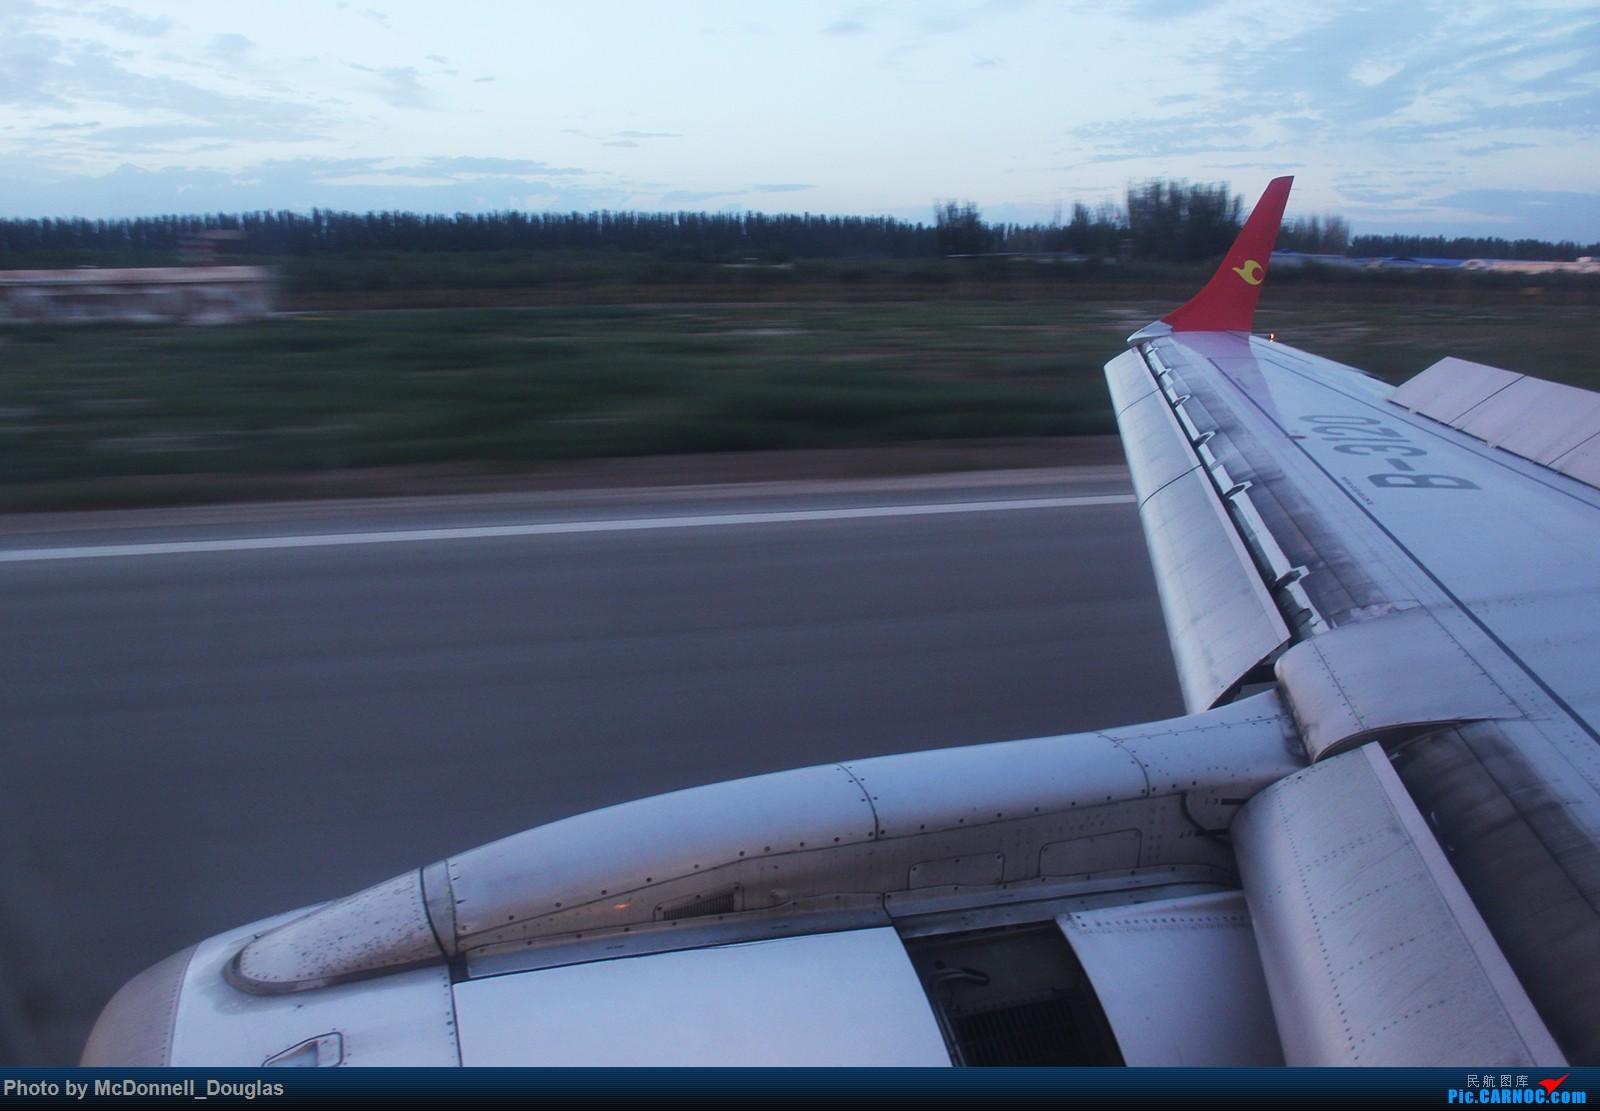 Re:[原创]【上海飞友会】【zc带你走天下(2)】再访祖辈年轻时工作的土地,父母年少时生活戈壁,跨越大半个中国去看新疆,回程小游蓉城(上) EMBRAER ERJ-190LR B-3120 中国阿克苏机场